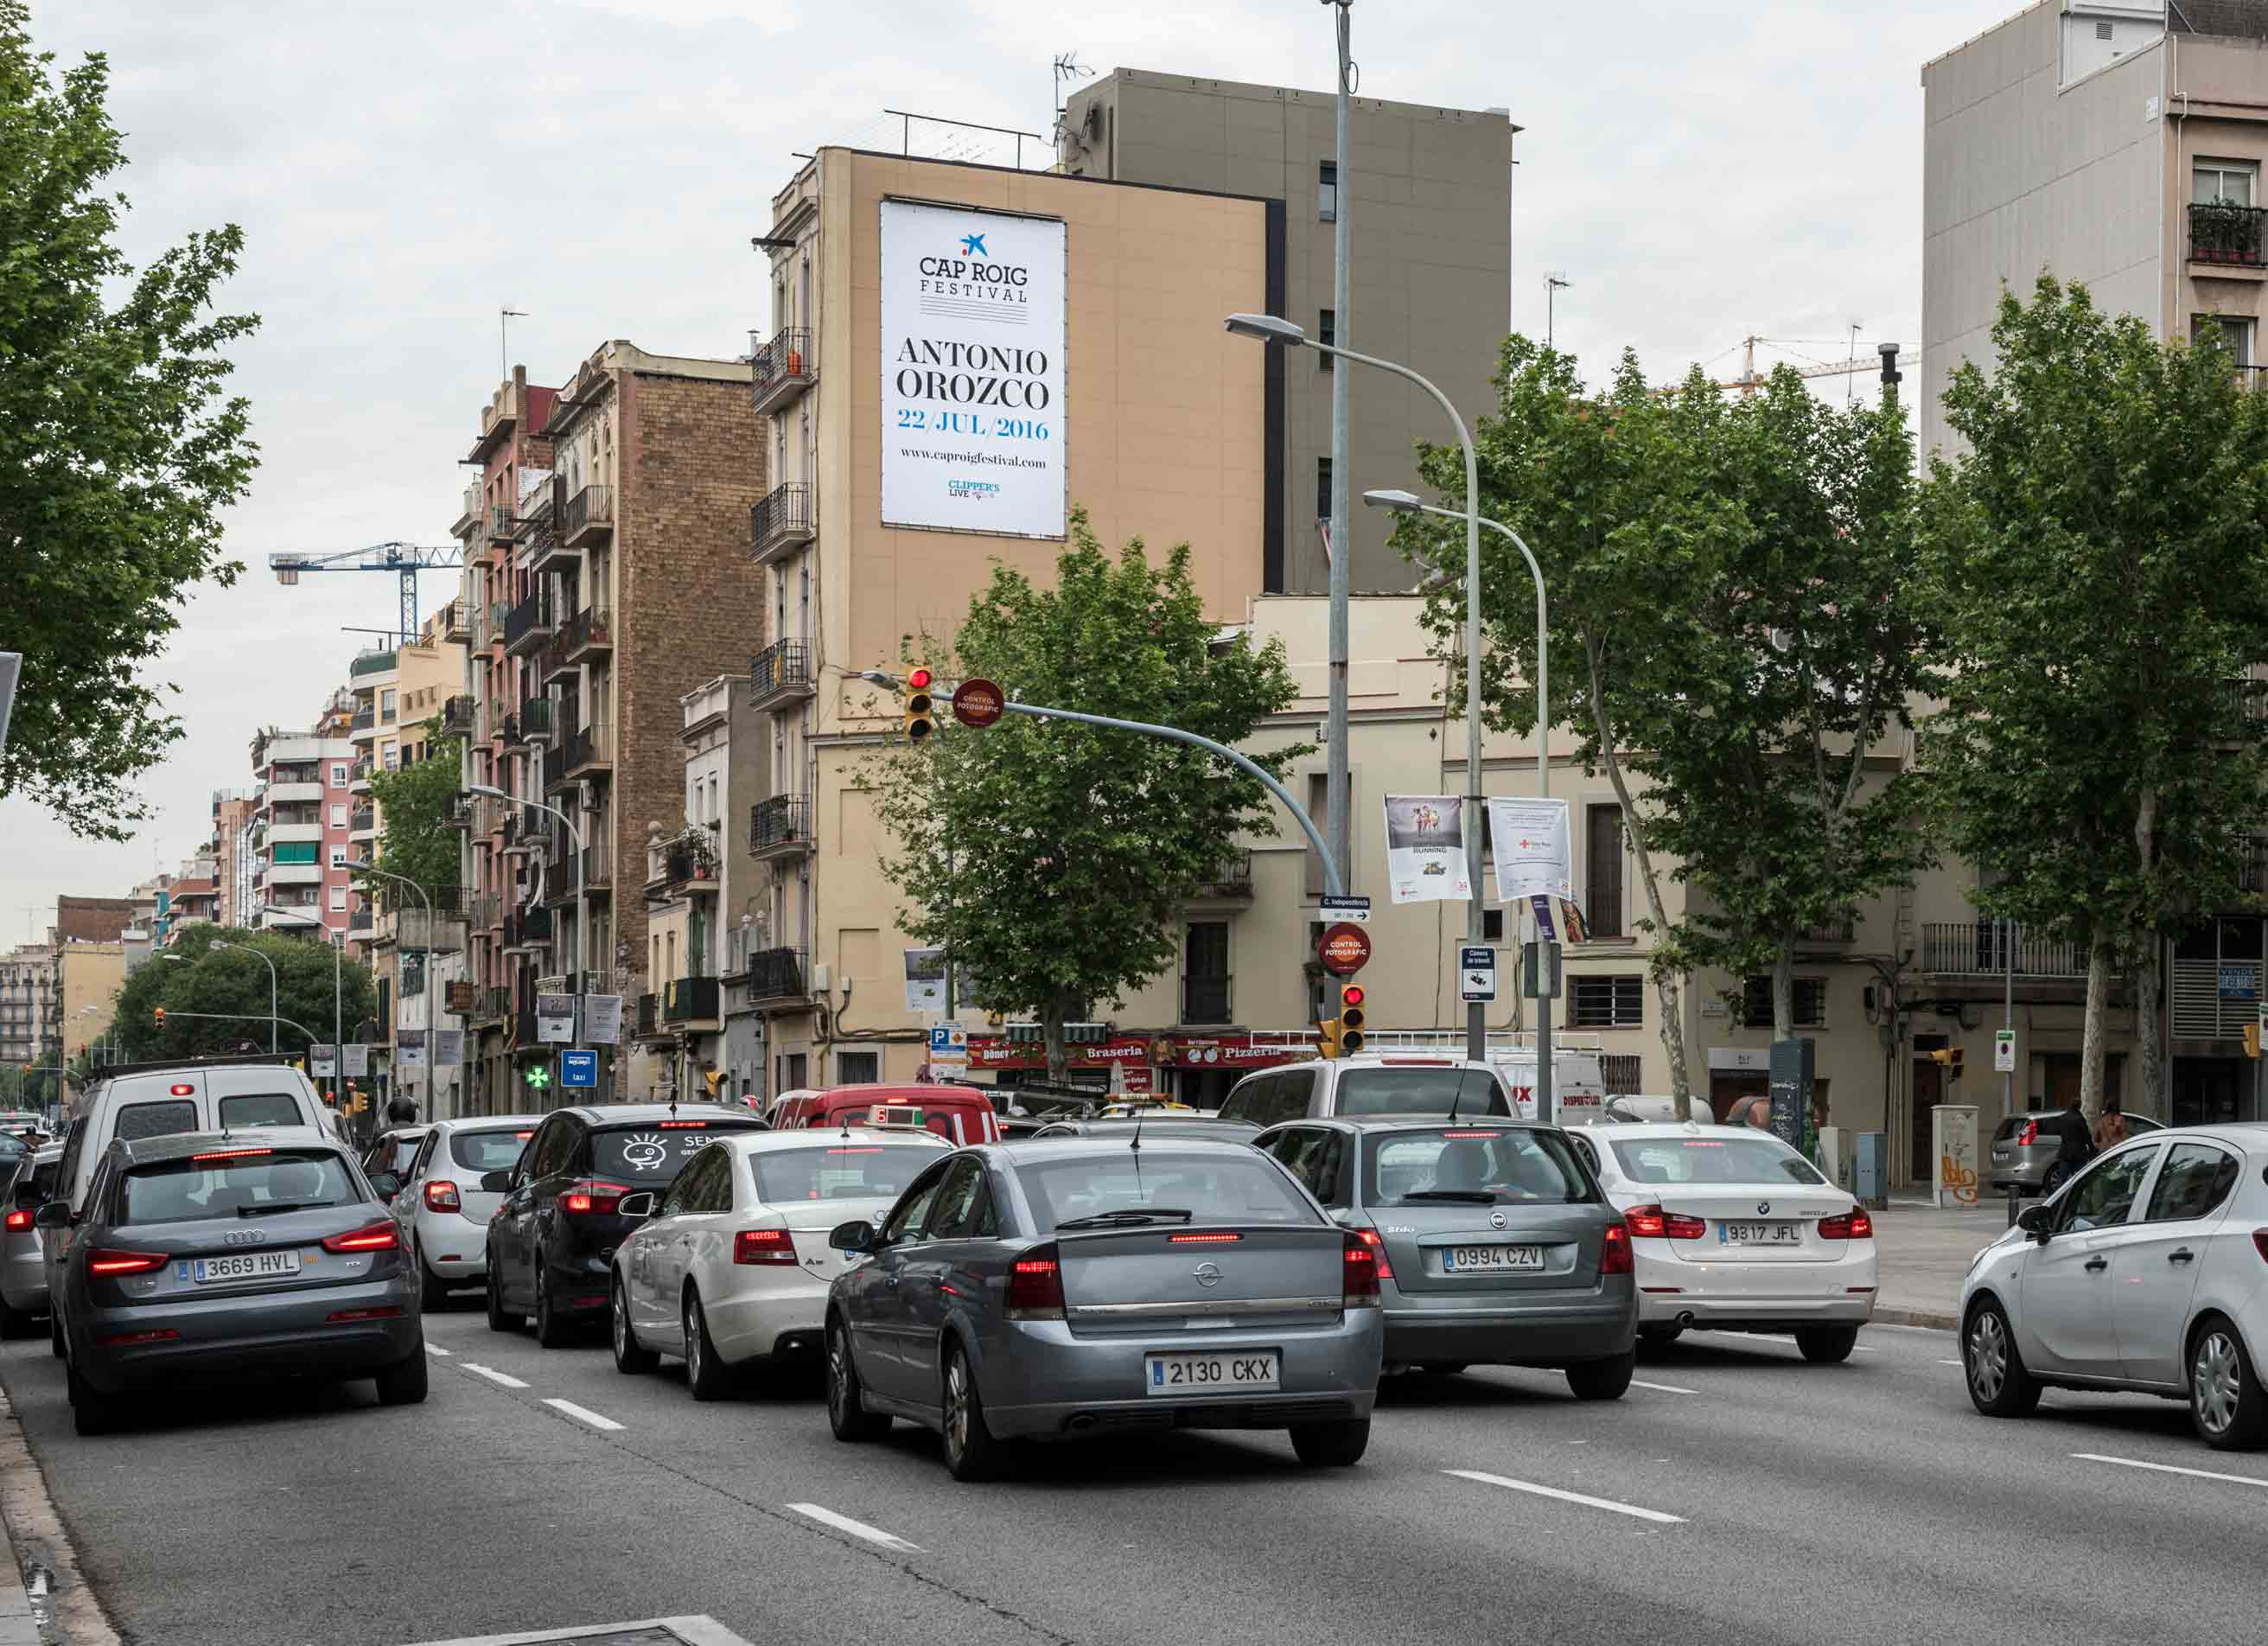 pym-barcelona-aragon-independencia-festival-cap-roig-vsa-comunicacion